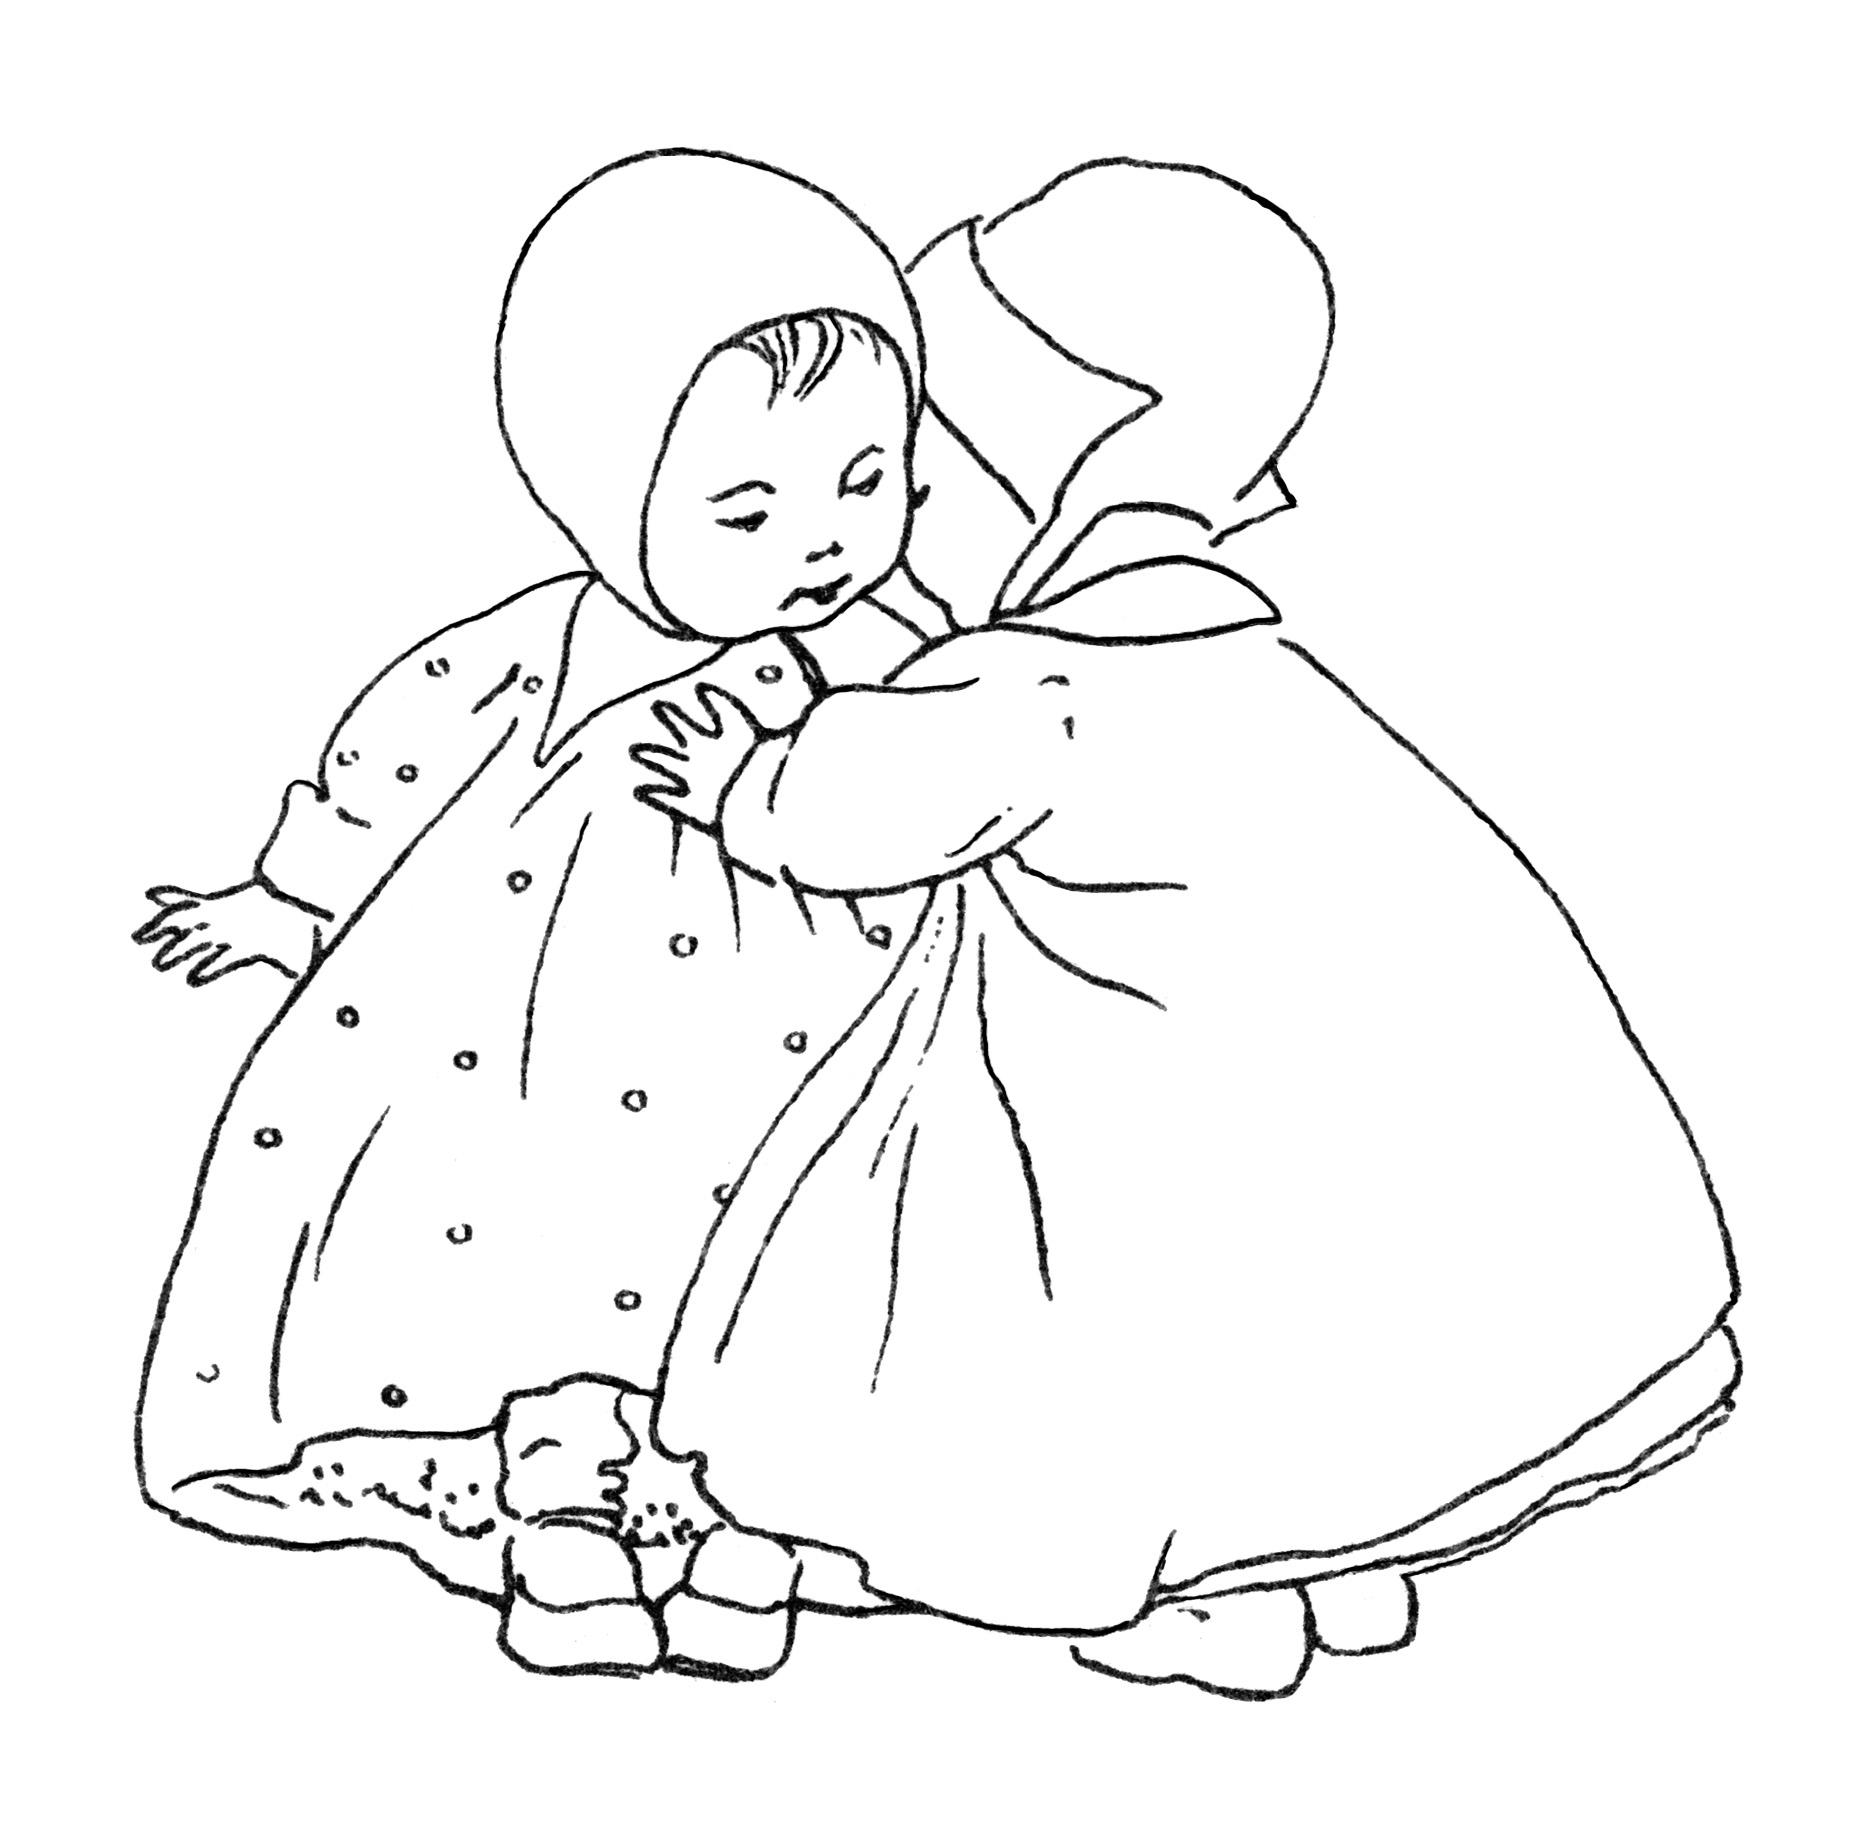 Babies clipart black and white. Old design shop blog